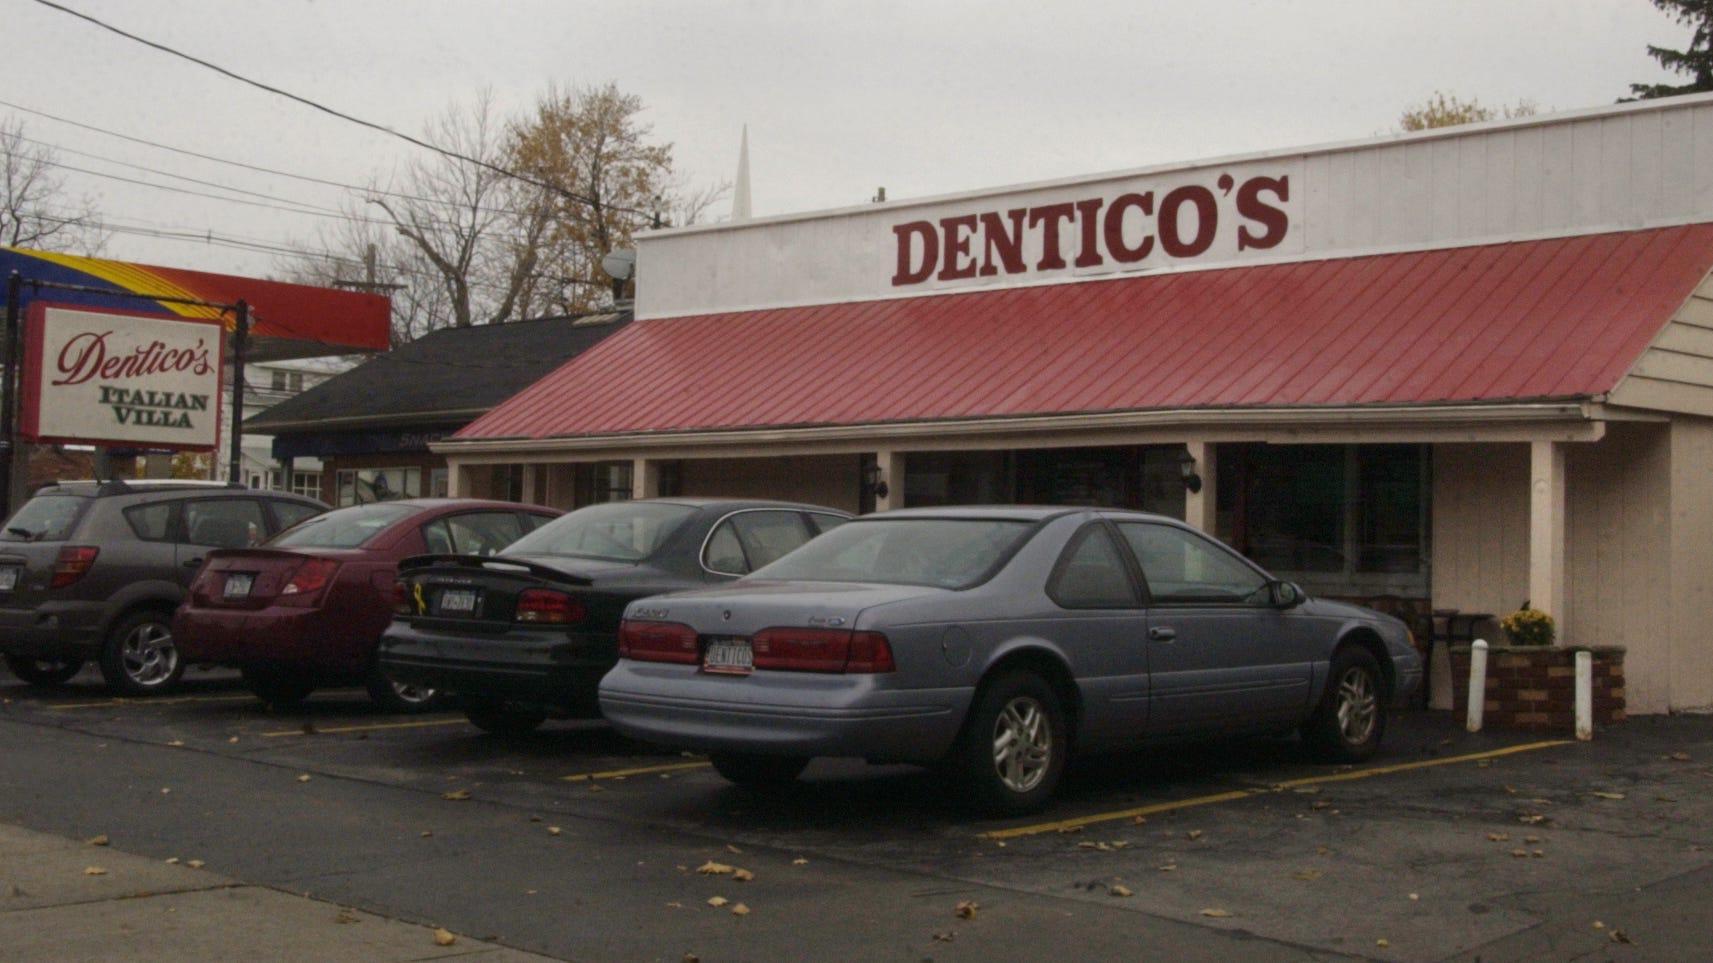 Whatever Happened to ... Dentico's Italian Villa?